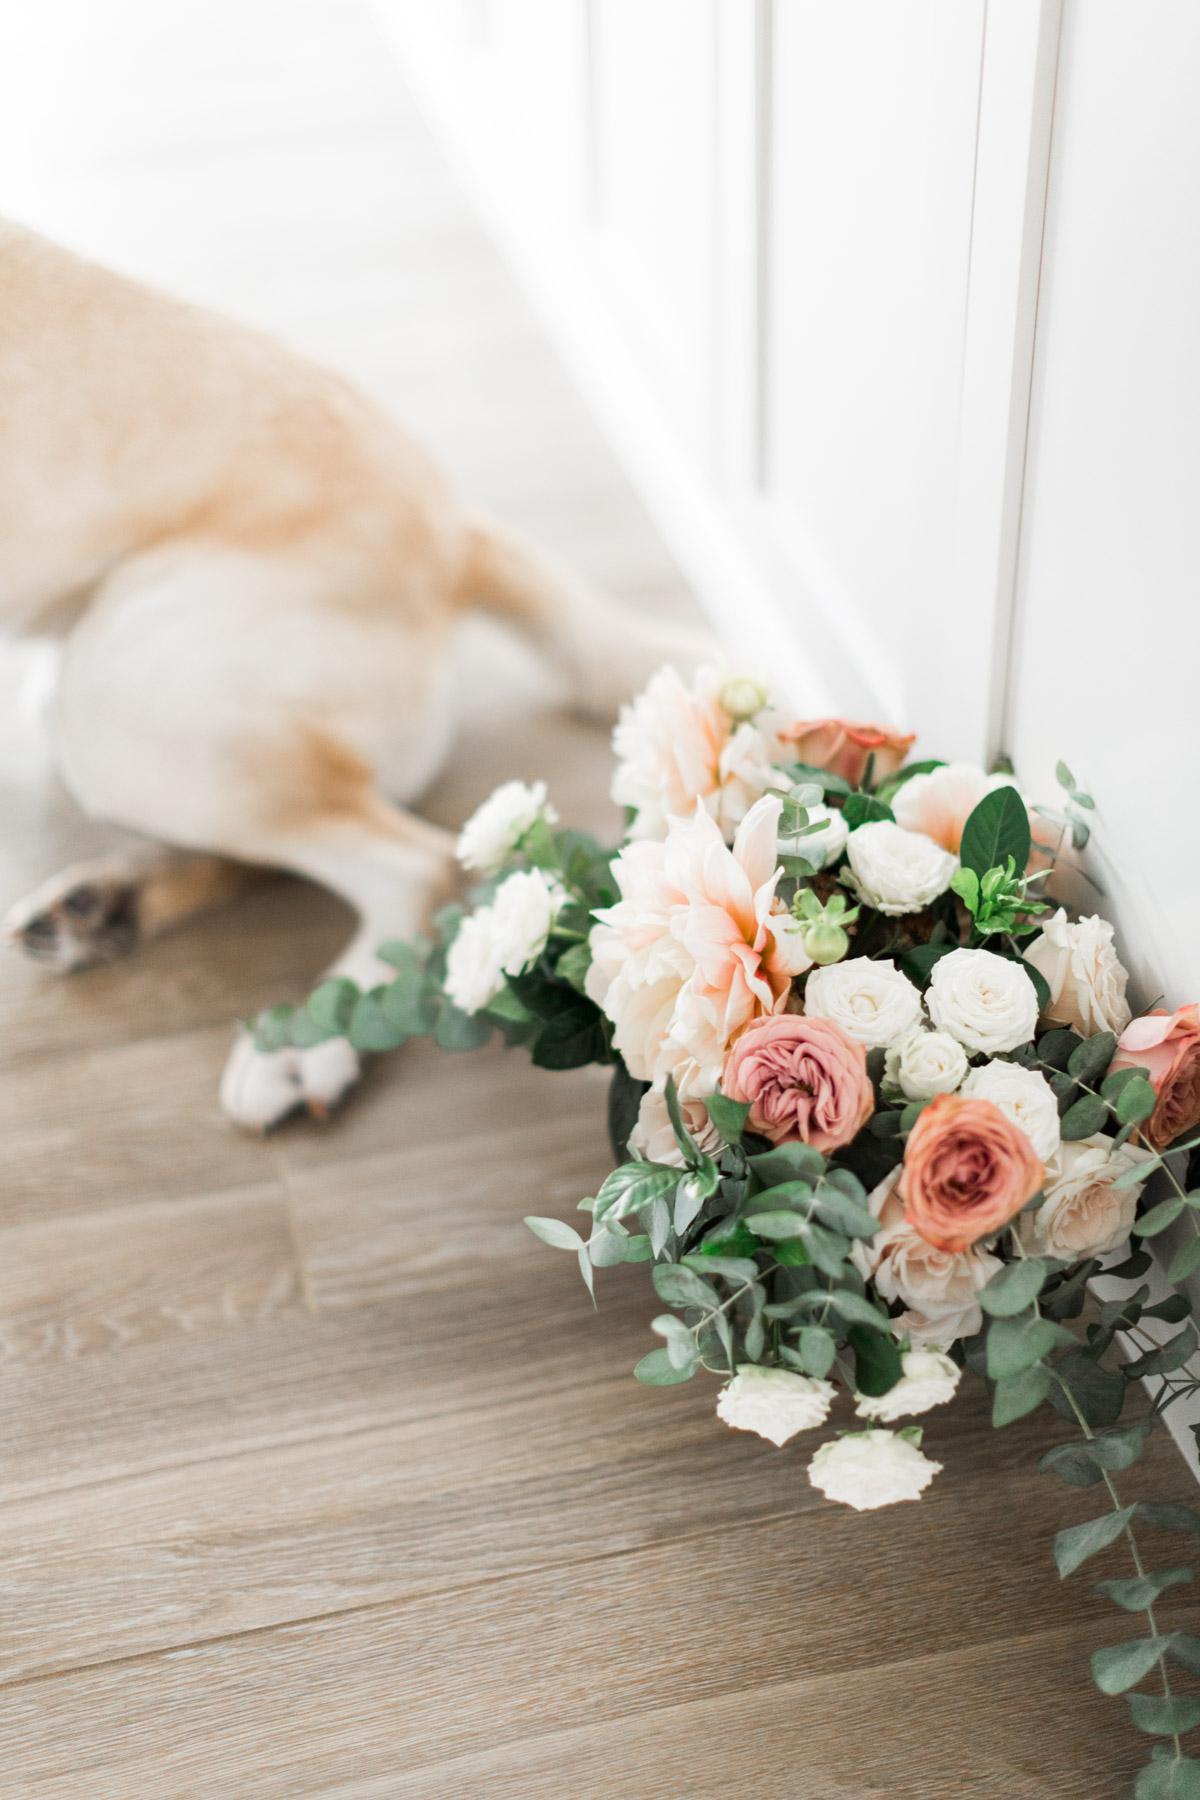 Elegant, classic, blush dahlia, cappuccino rose and eucalyptus bridal bouquet | Newport Beach, CA | Compass Floral | Wedding Florist in San Diego and Southern California | Cavin Elizabeth Photography